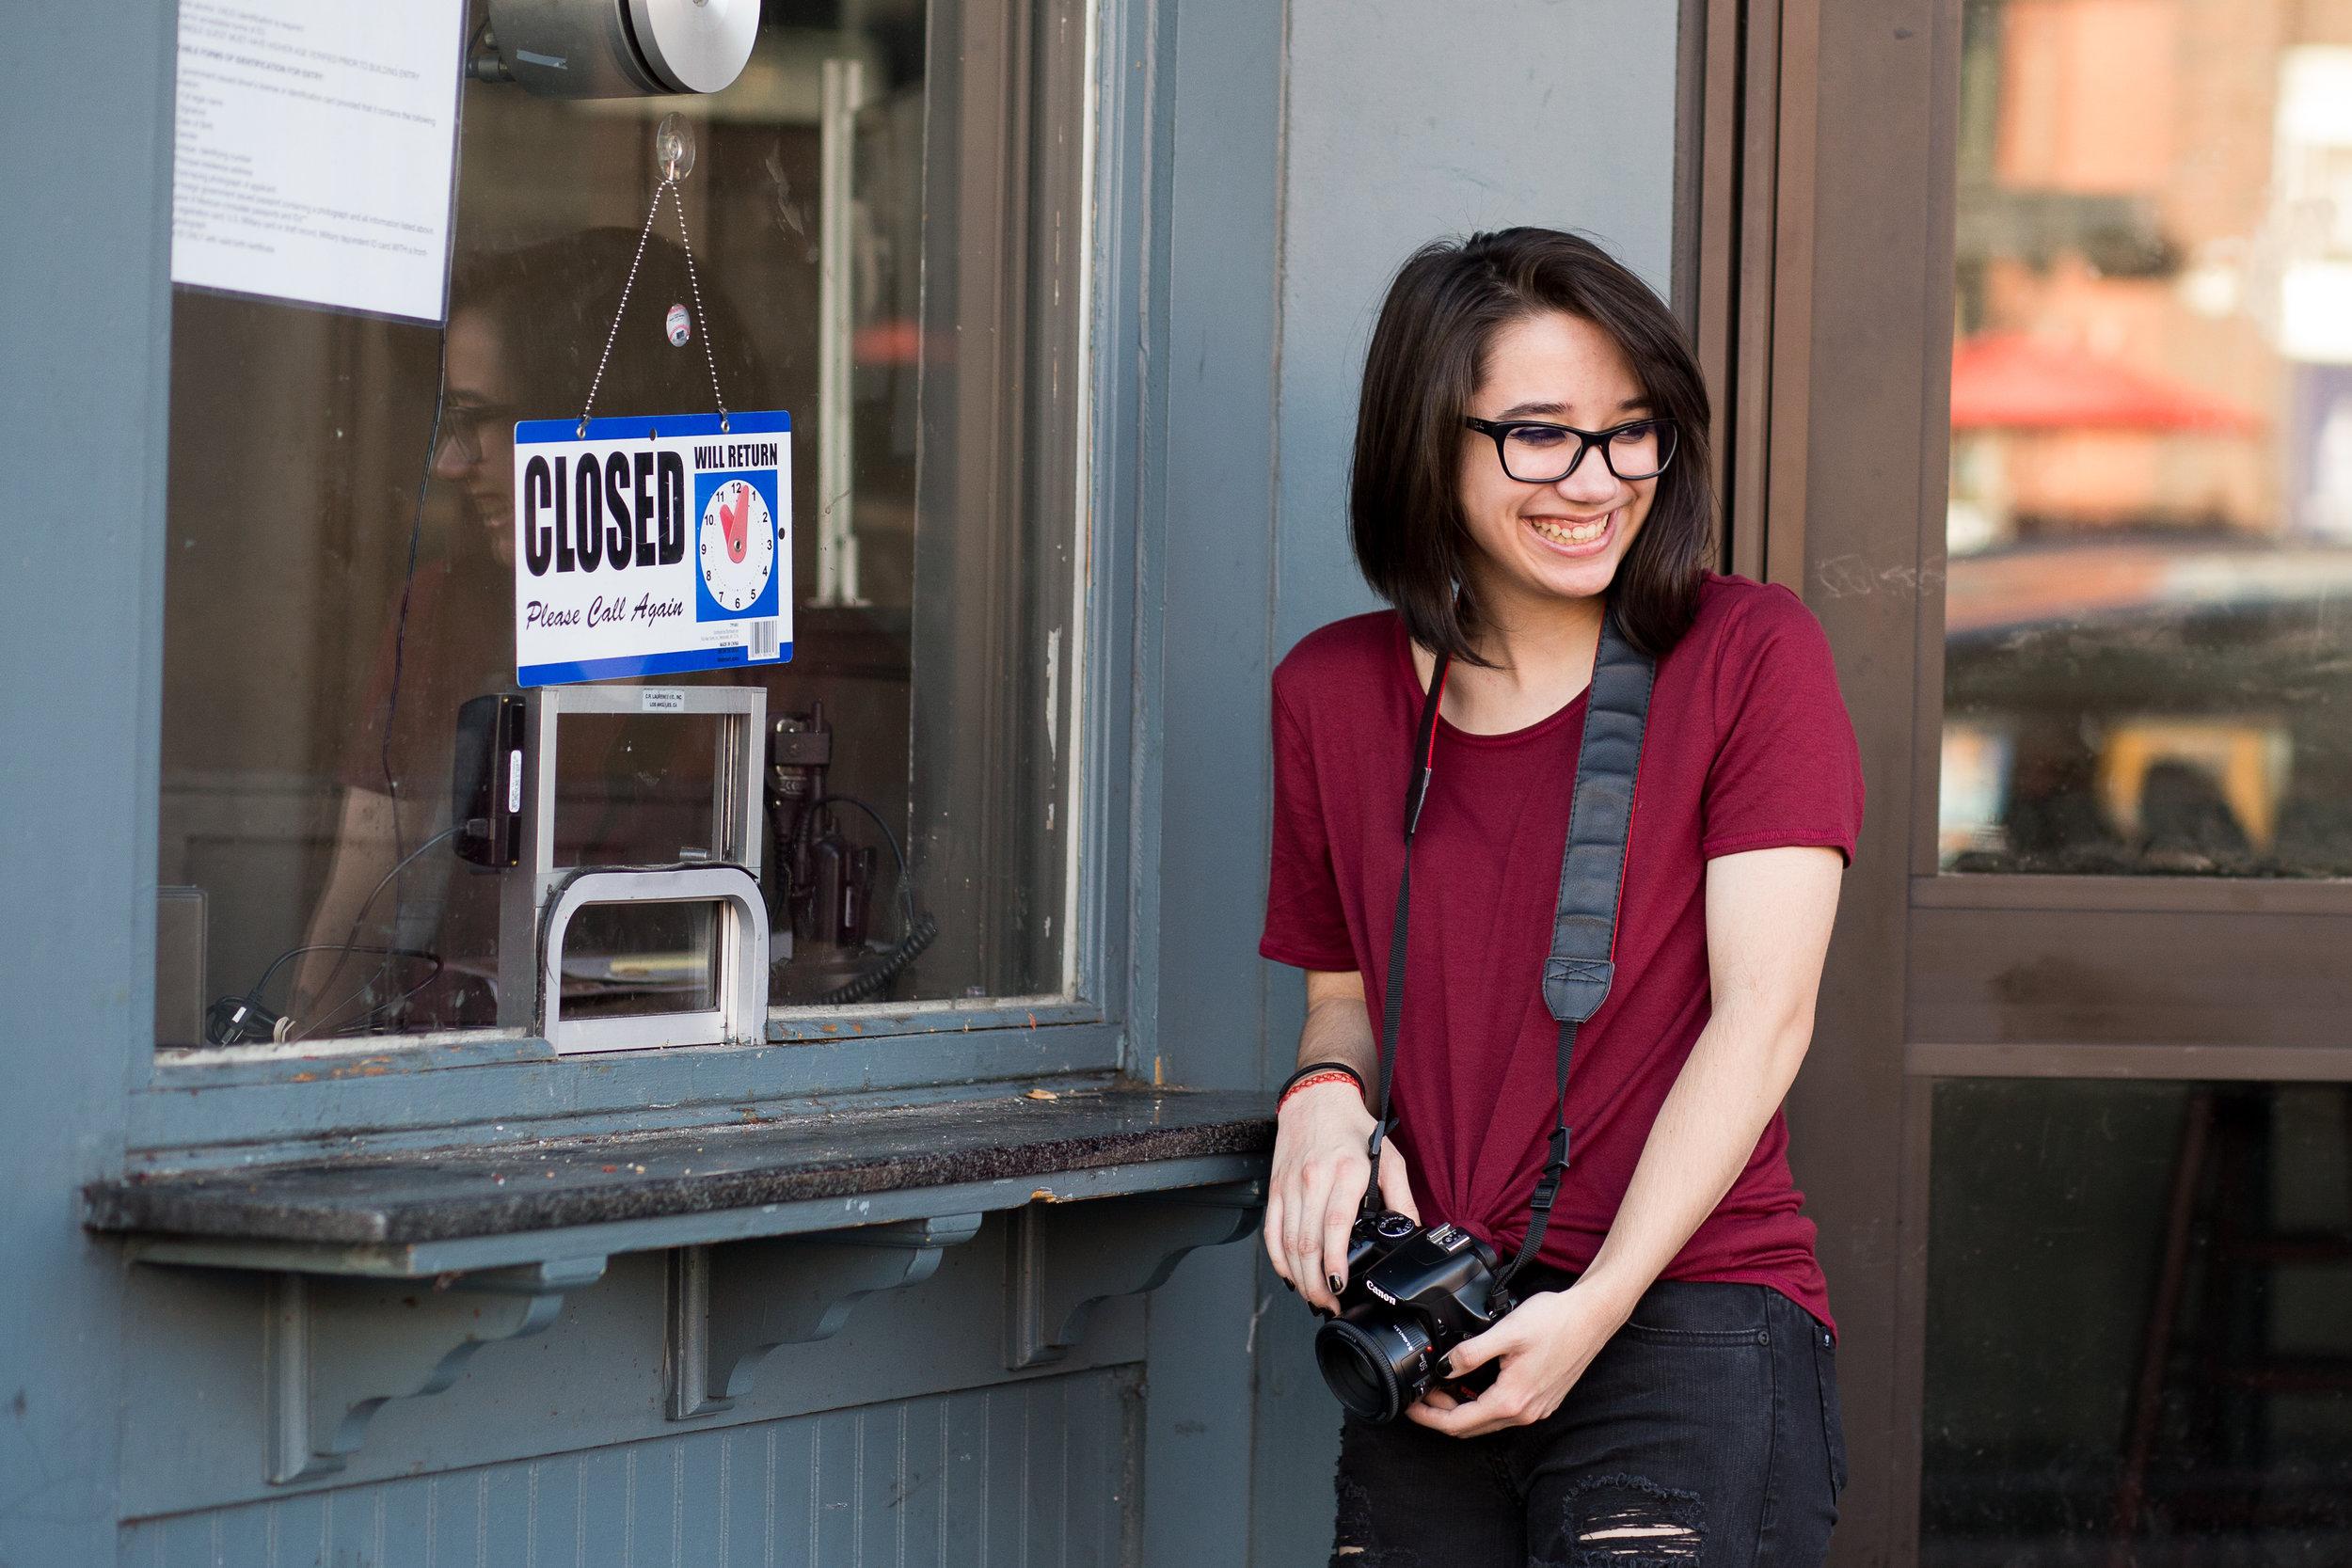 Colorado Springs Senior Photography | Colorado Springs Senior Photographer | Girl red shirt holding camera and laughing | Stacy Carosa Photography